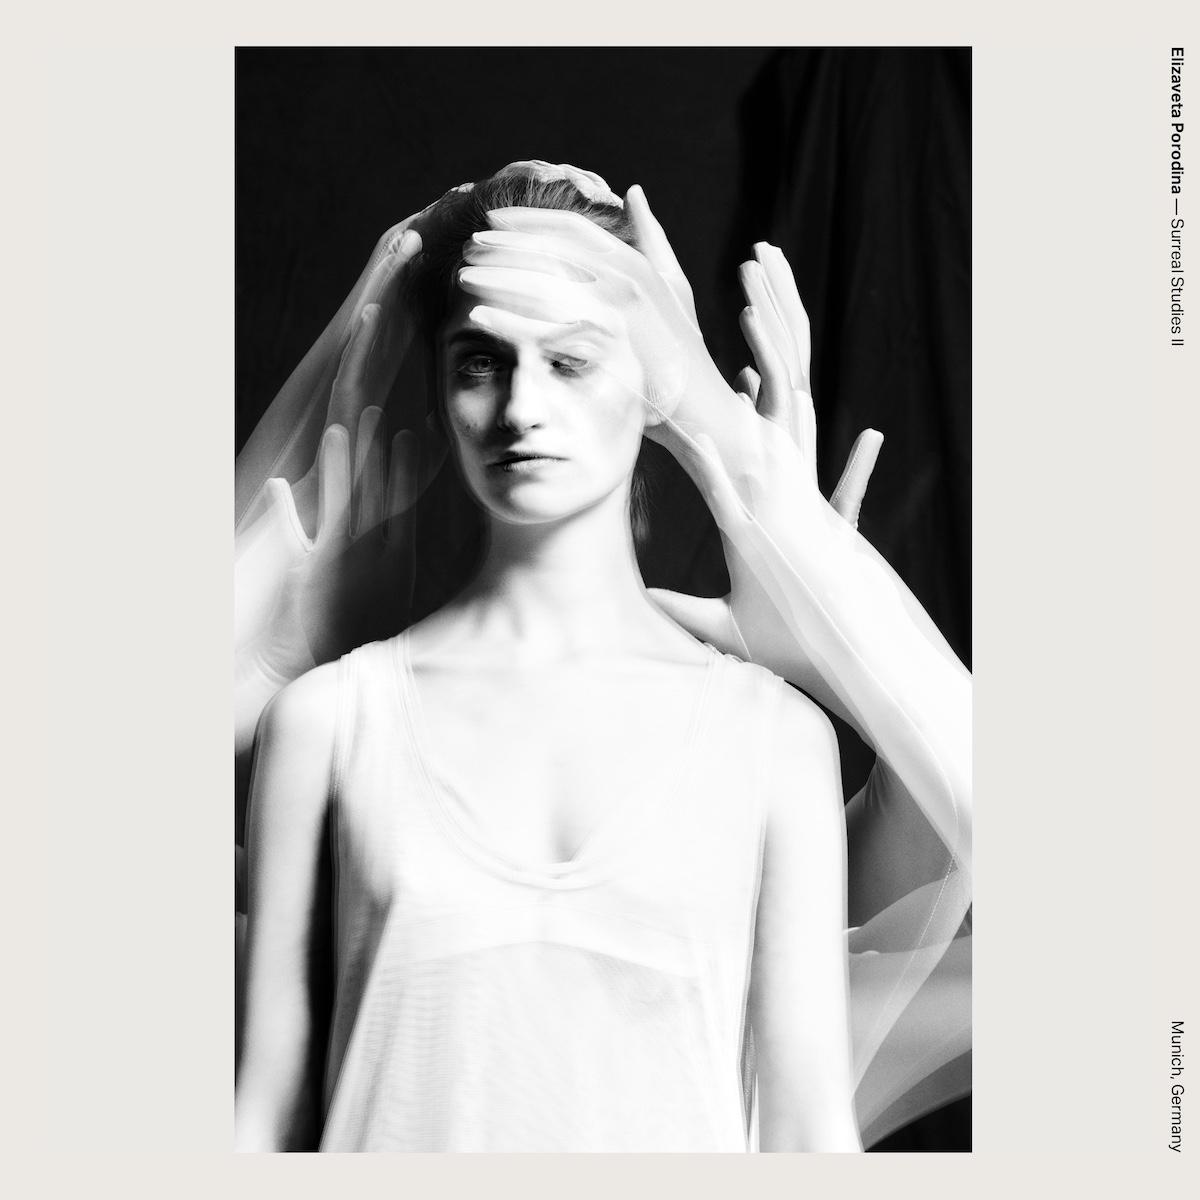 Elizaveta Porodina — Surreal Studies II